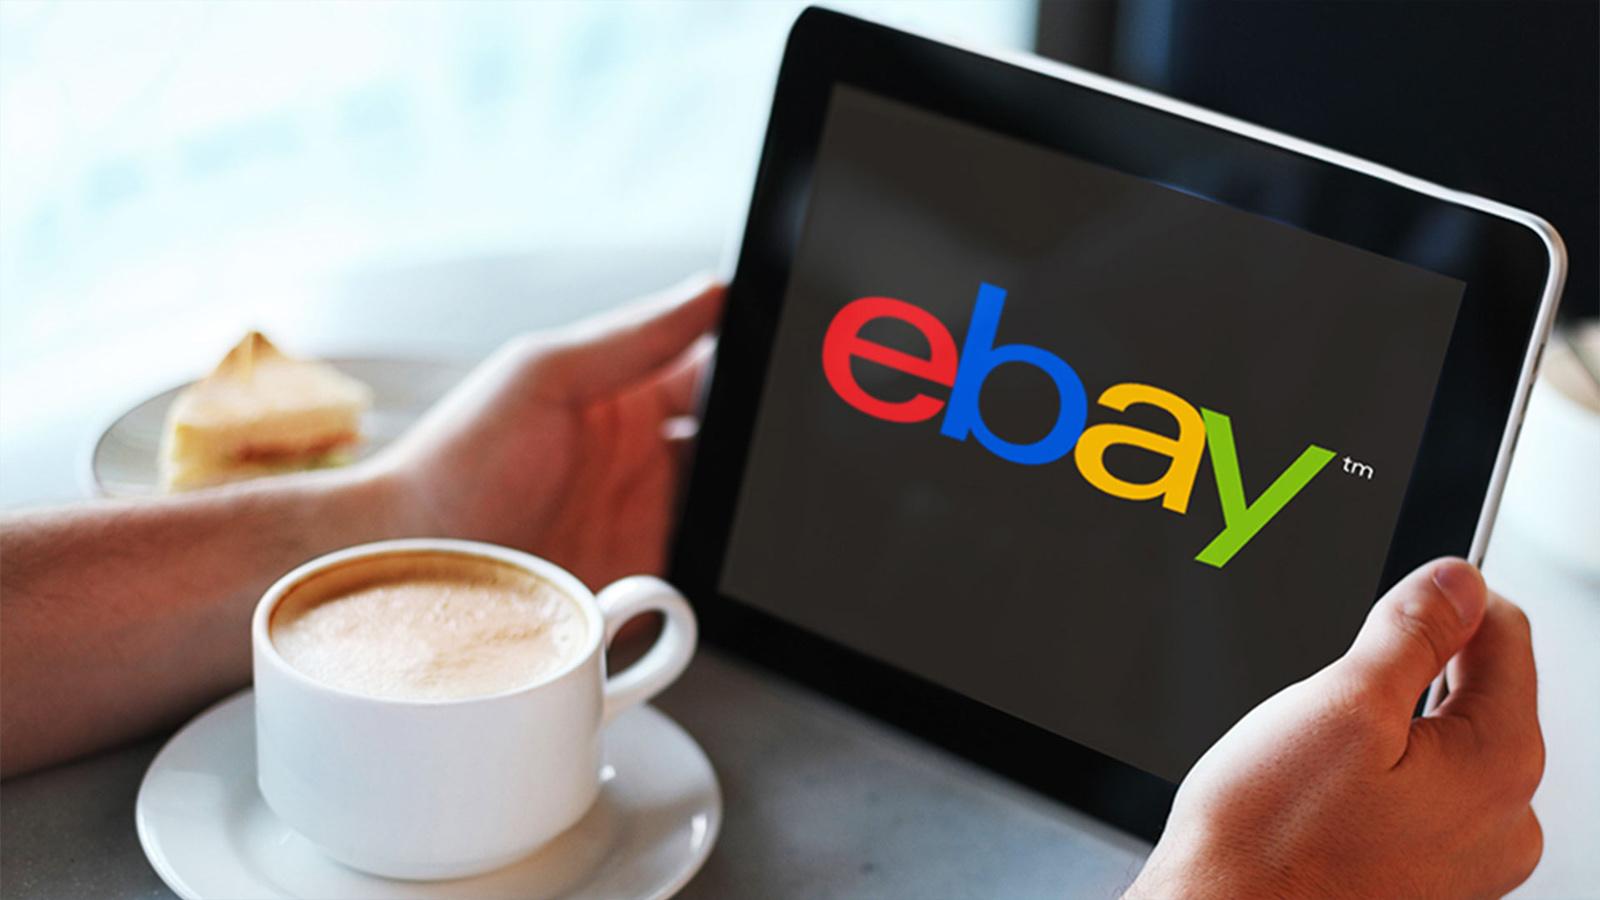 eBay fixes flaws